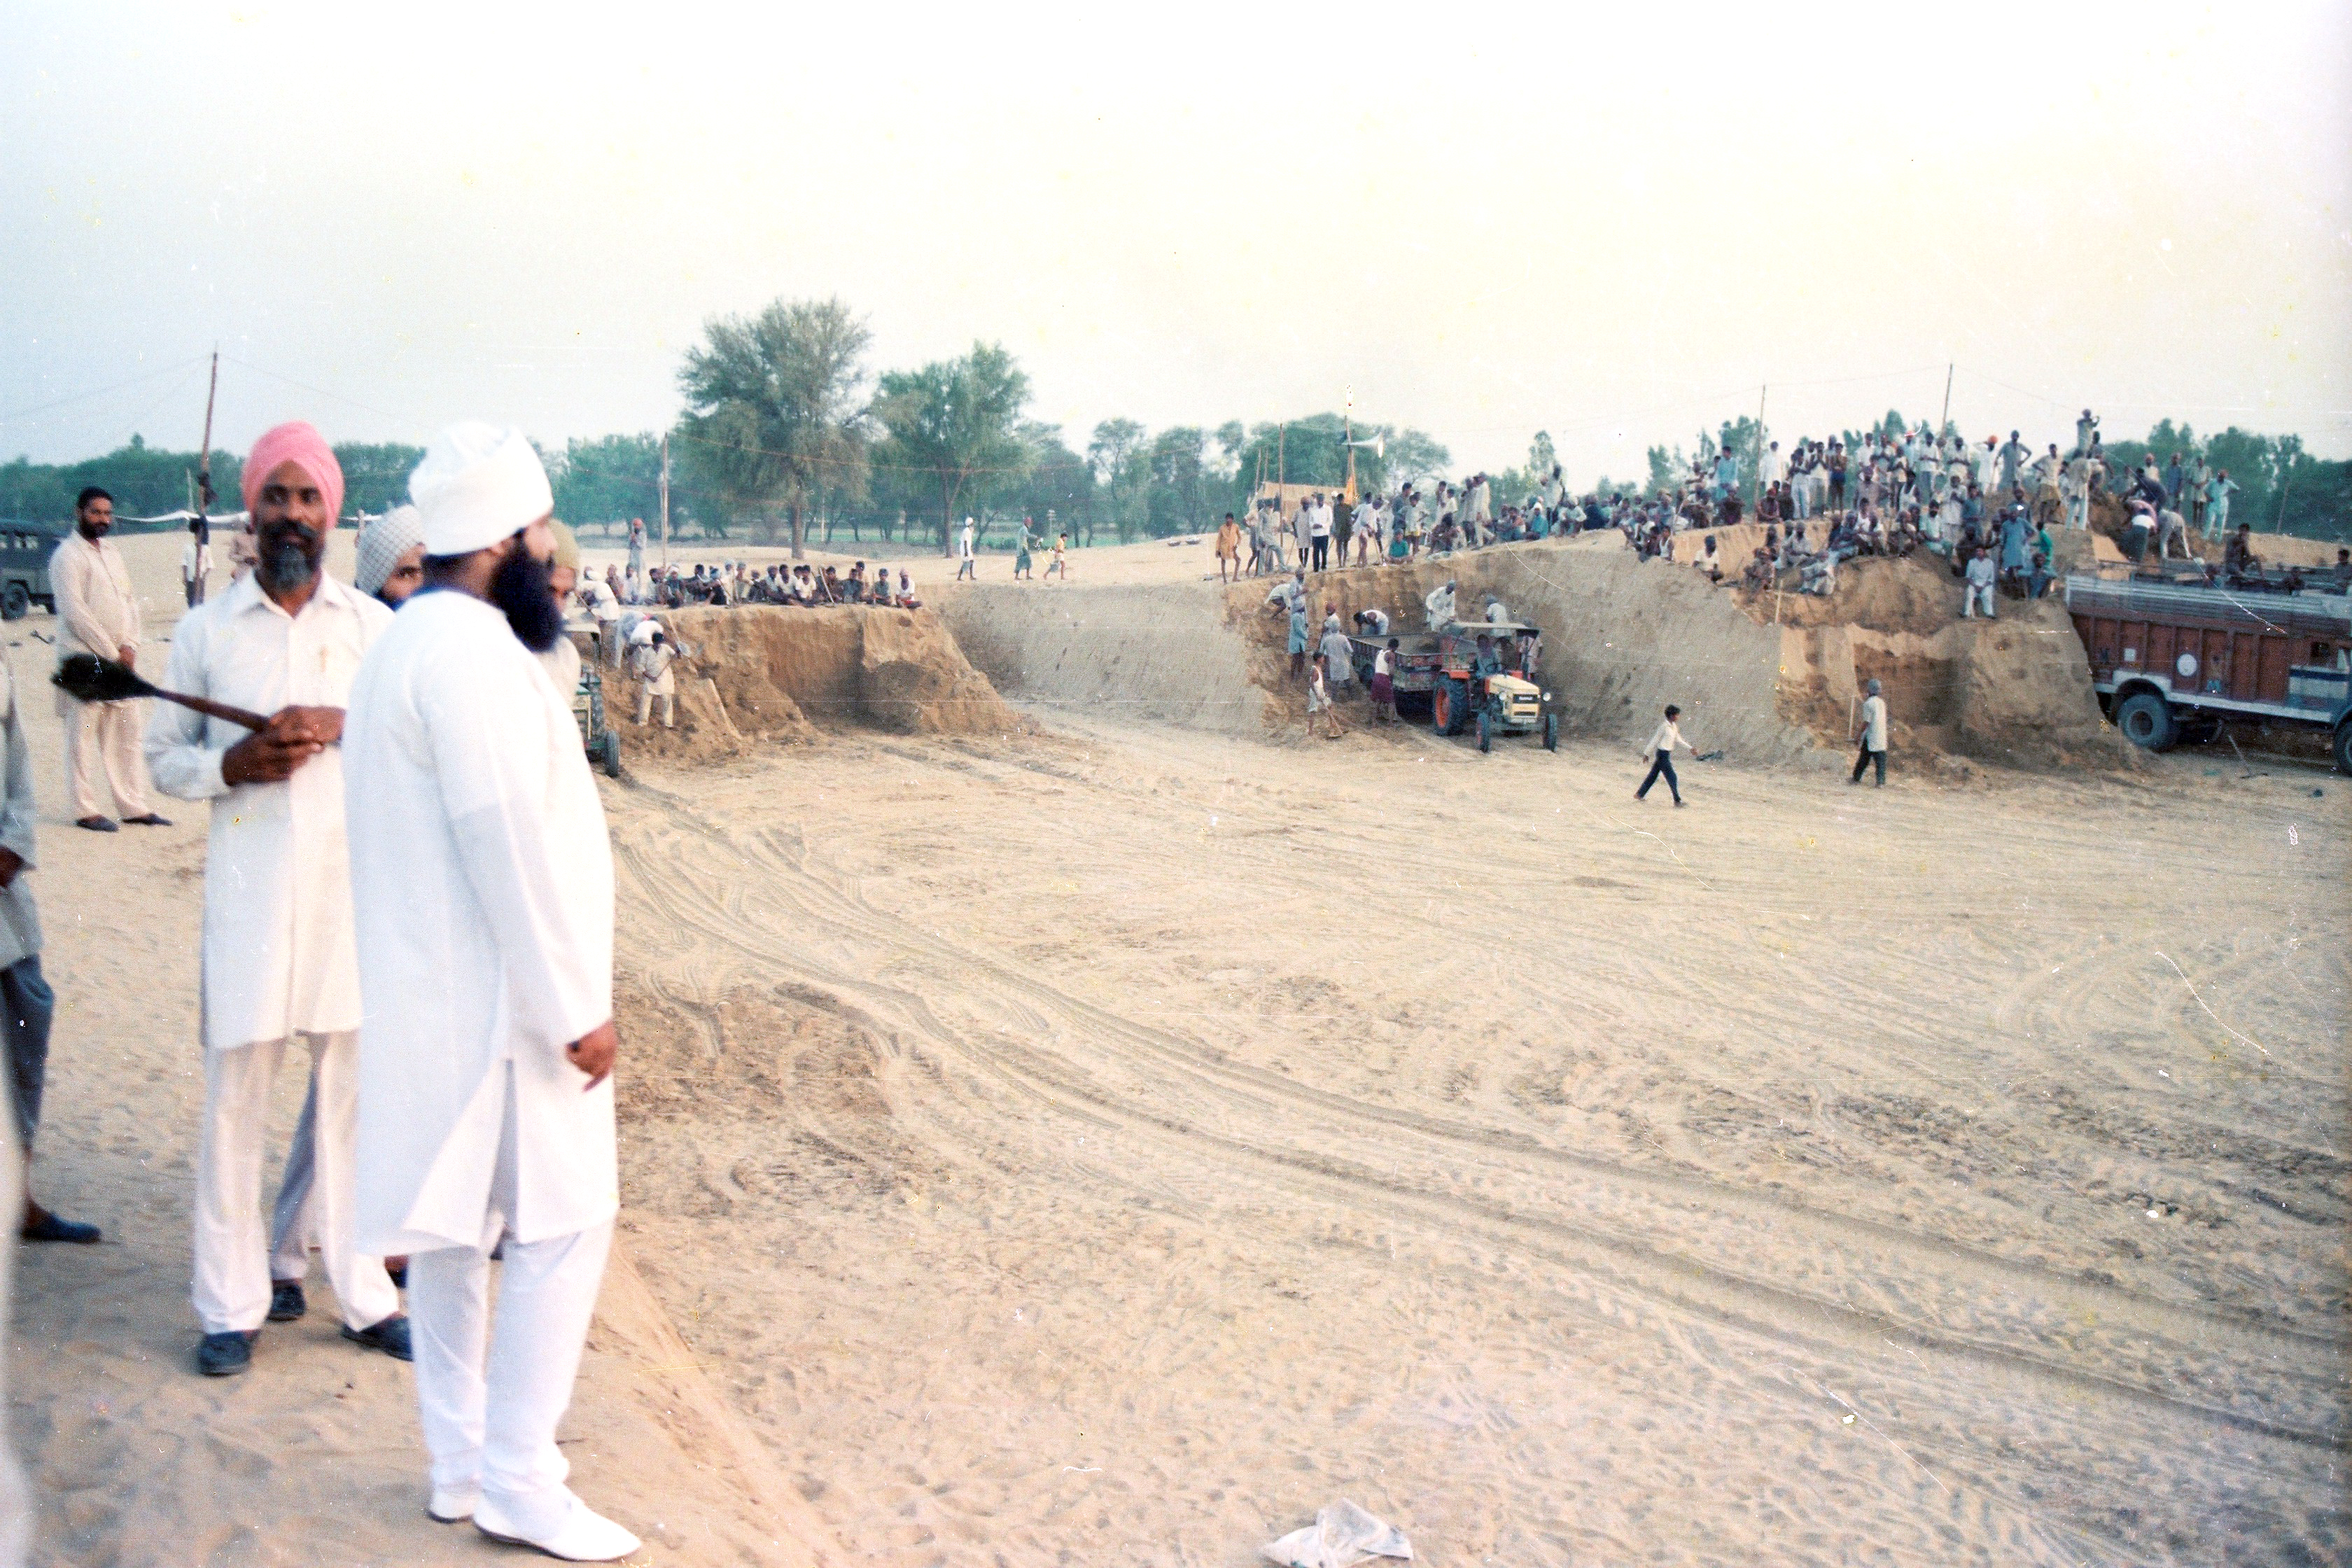 Establishment of Dera Sacha Sauda